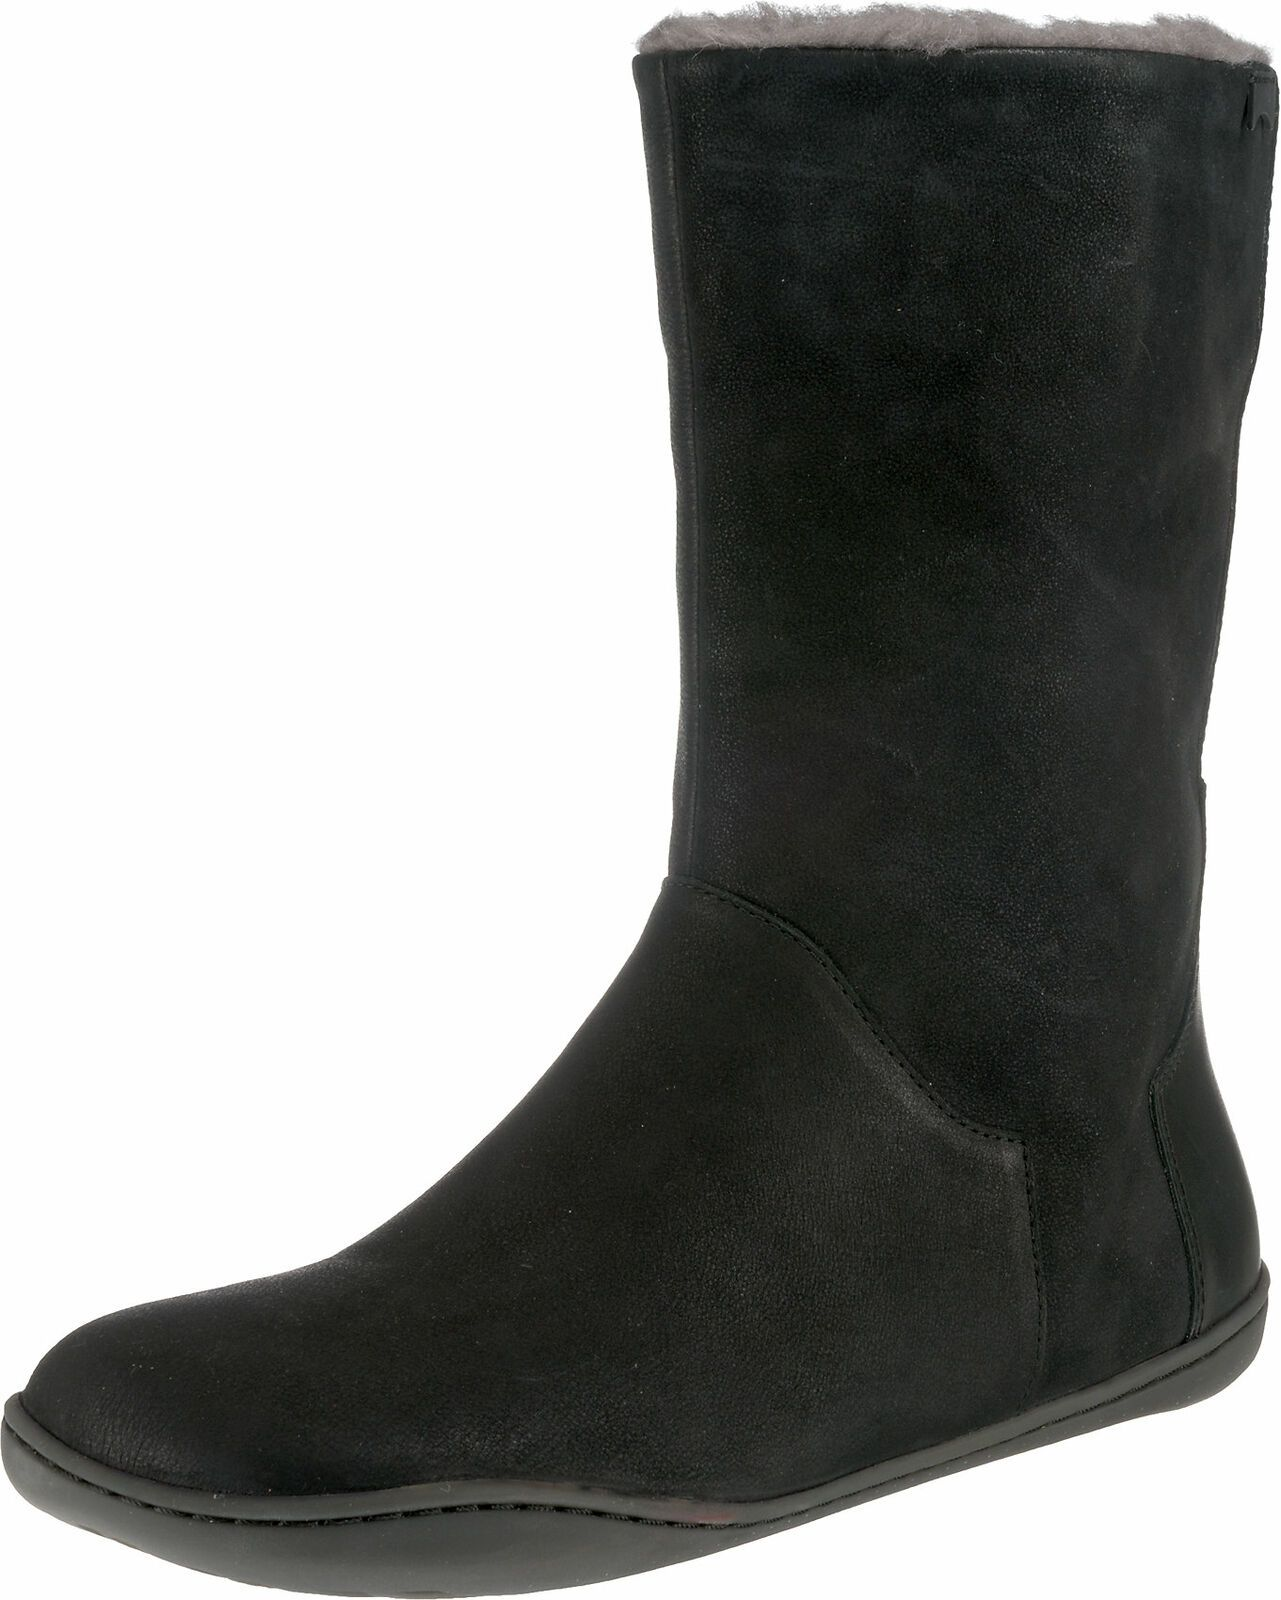 893616 Damen Worker Boots Warm Gefütterte Stiefel Profil Winterstiefel New Look